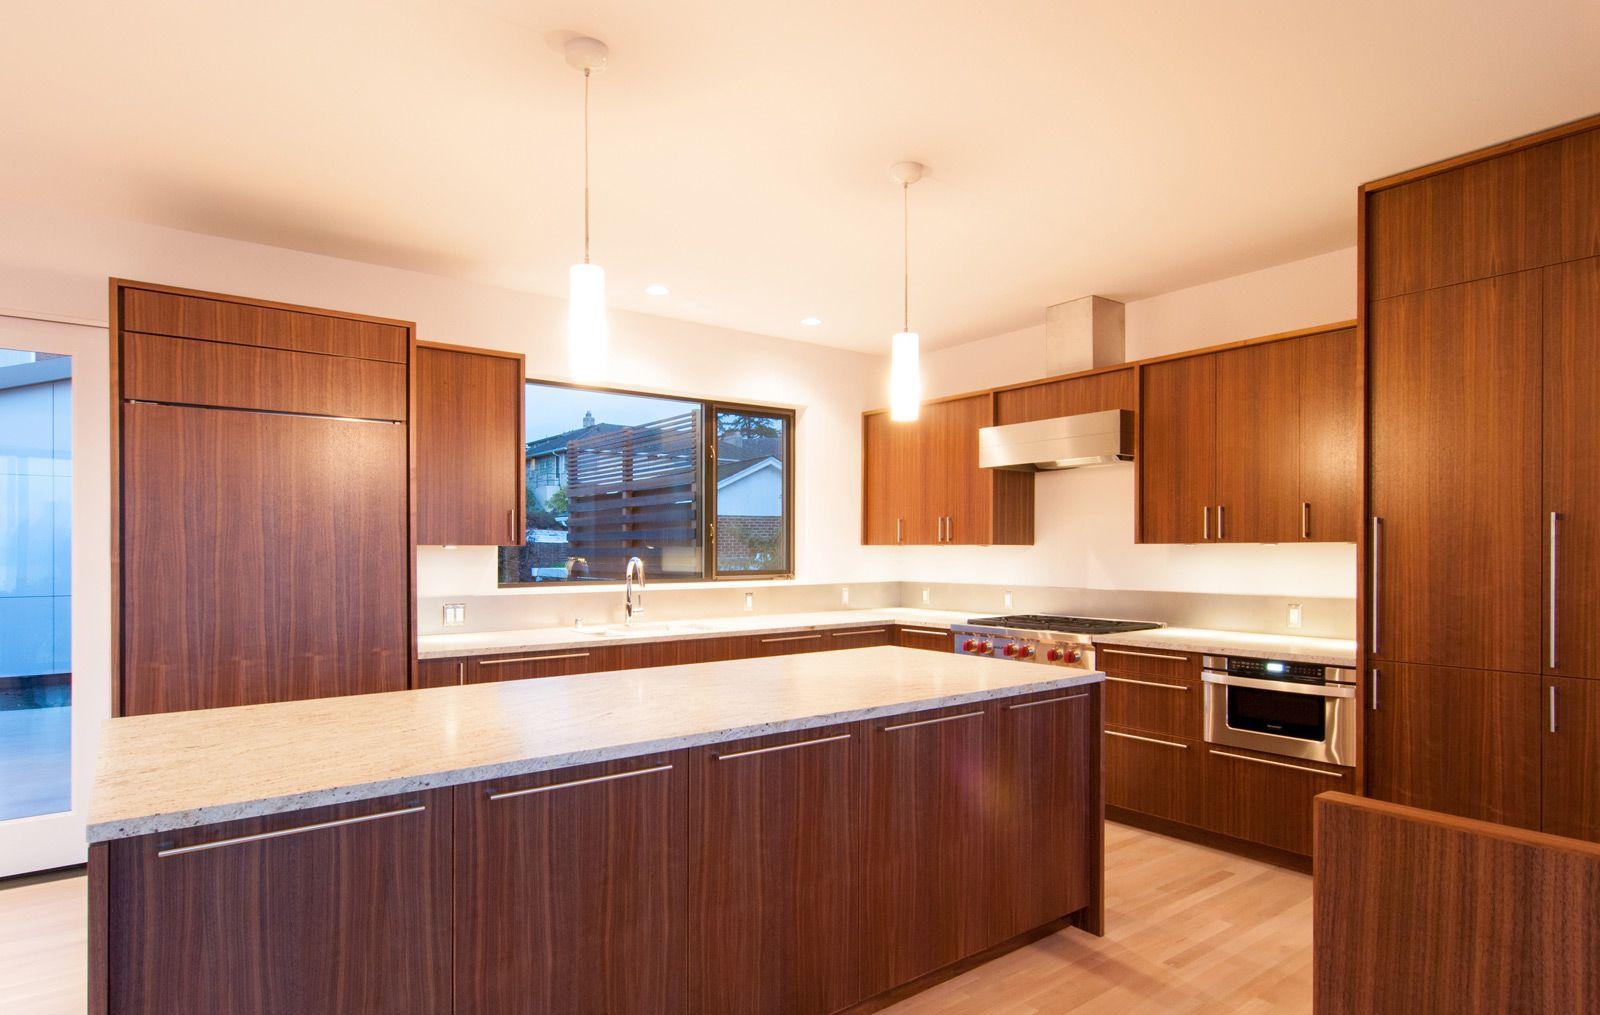 Modern Kitchen With Zebra Wood Cabinetry And White Countertops Interior Design Kitchen White Countertops Modern Kitchen